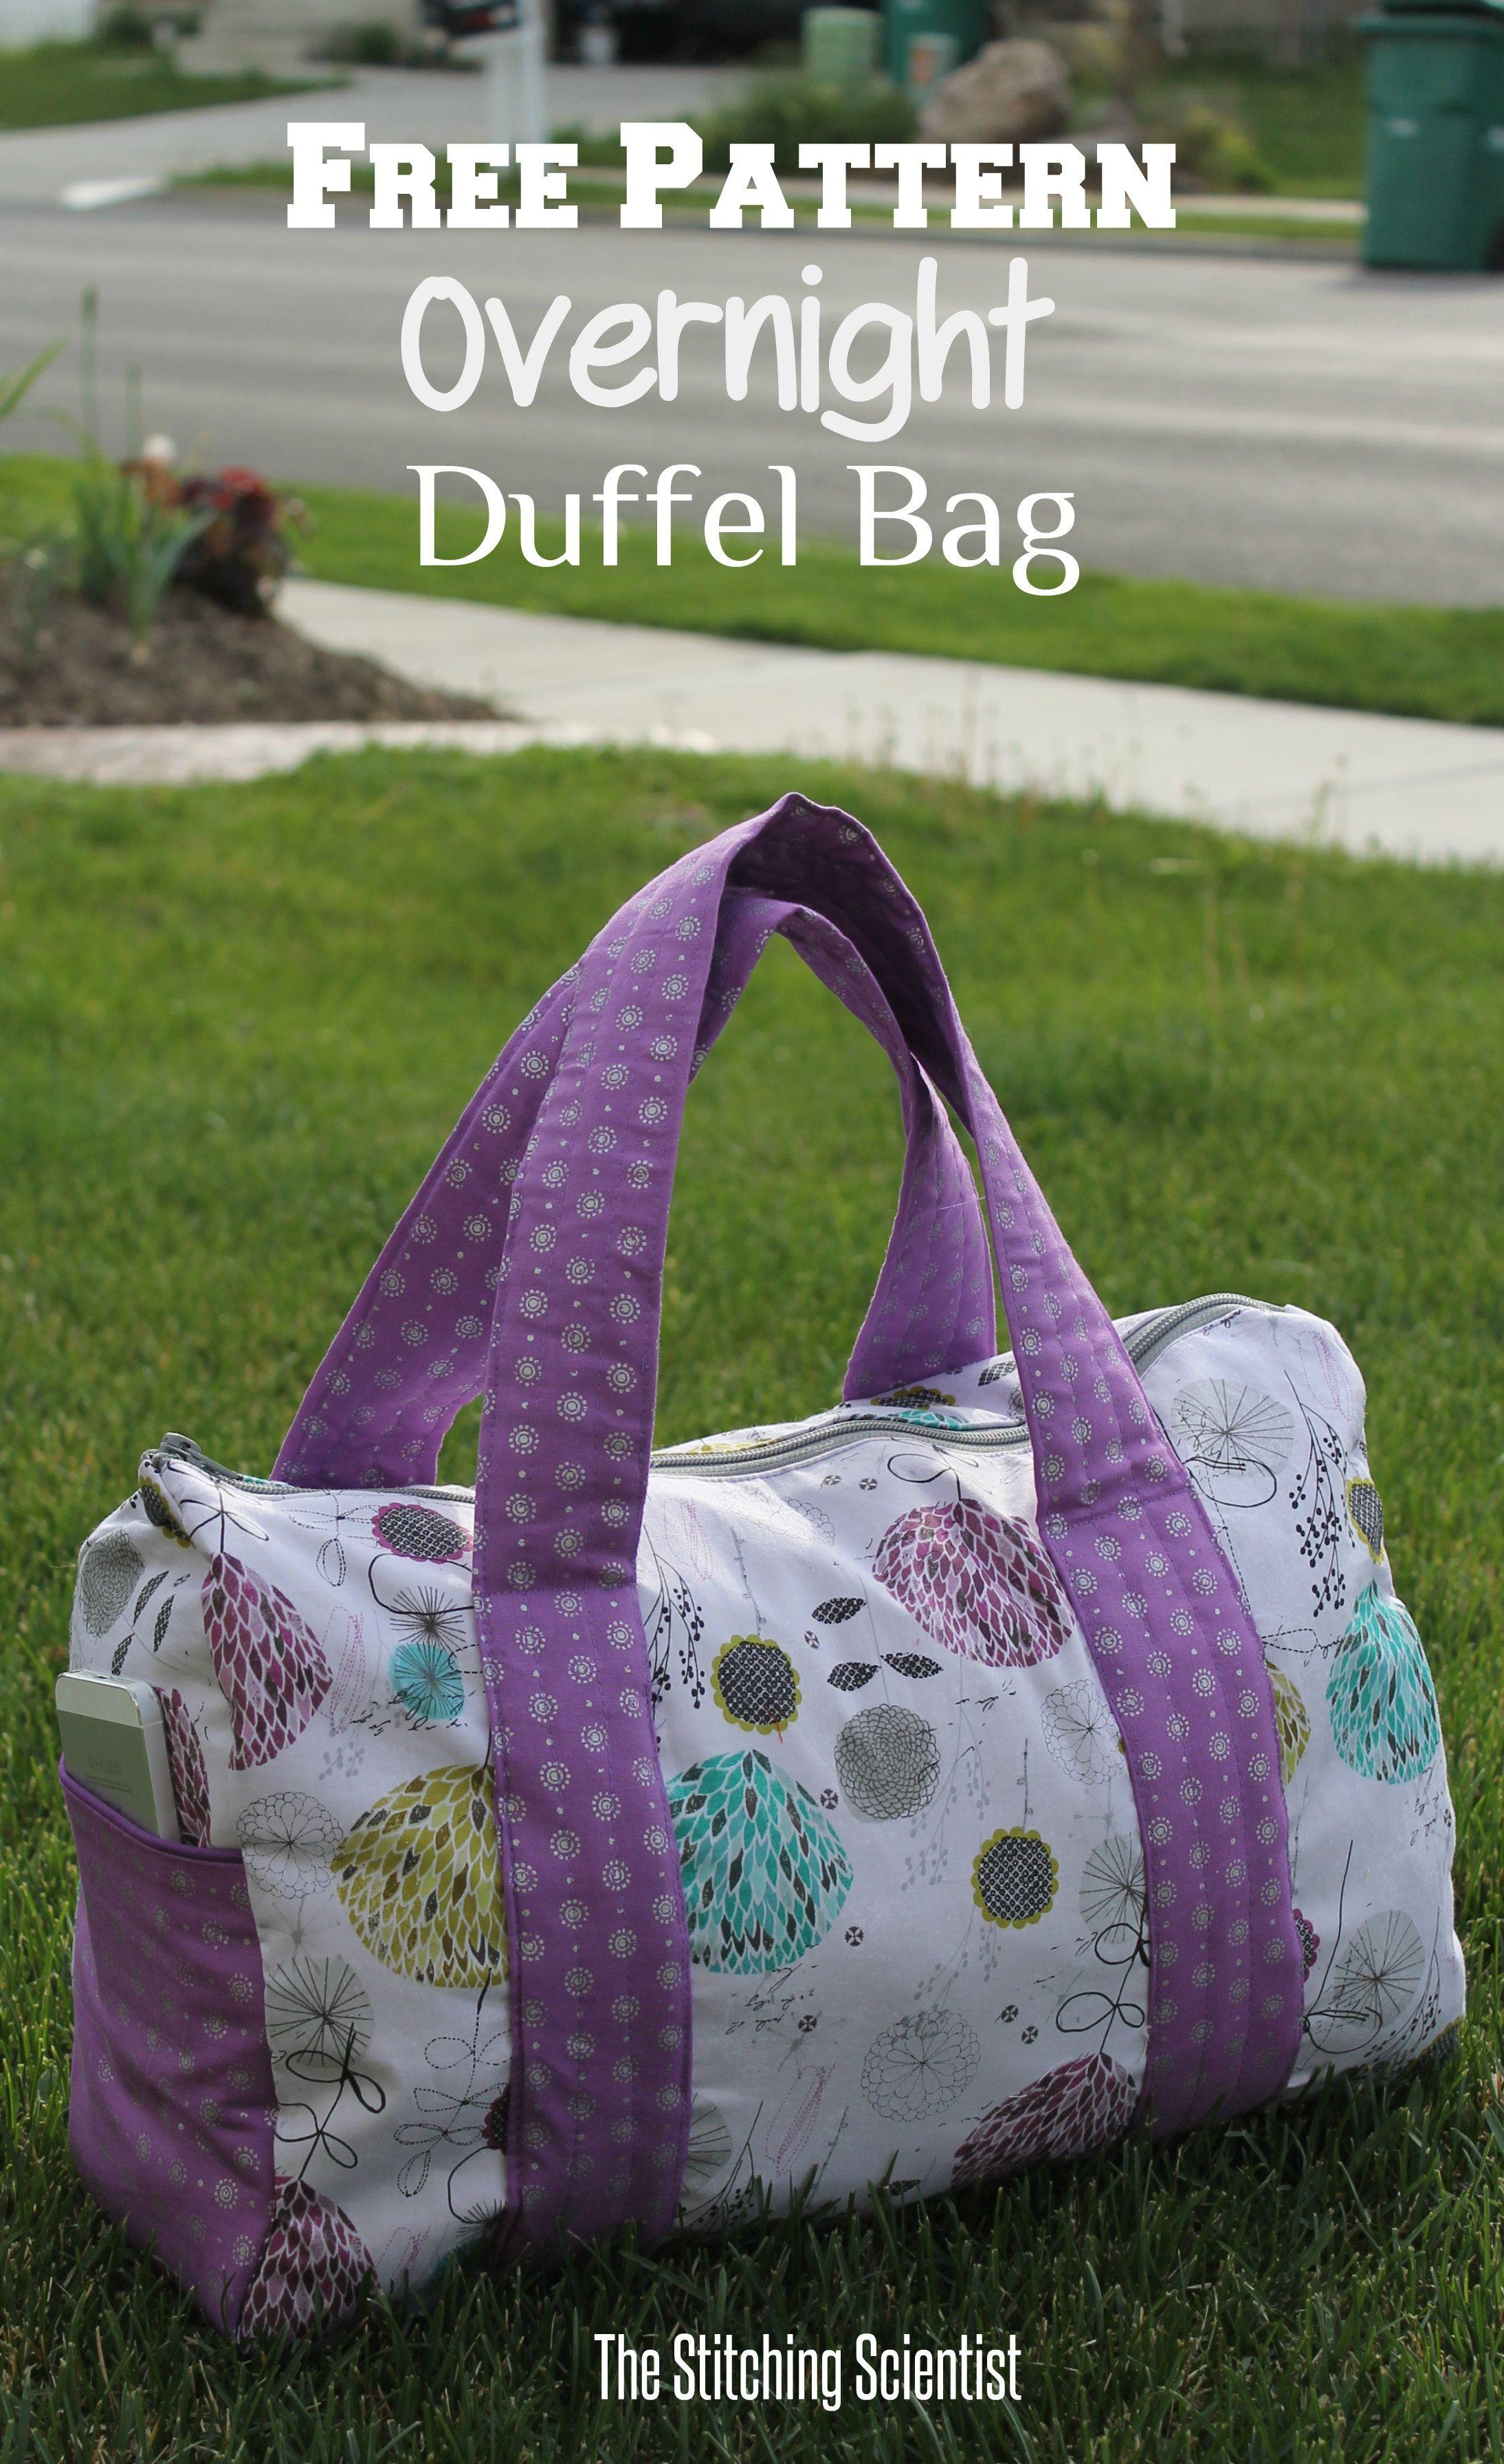 Free Pattern Overnight Duffel Bag   Sewing   Pinterest   Sewing ... 17abb8ad03